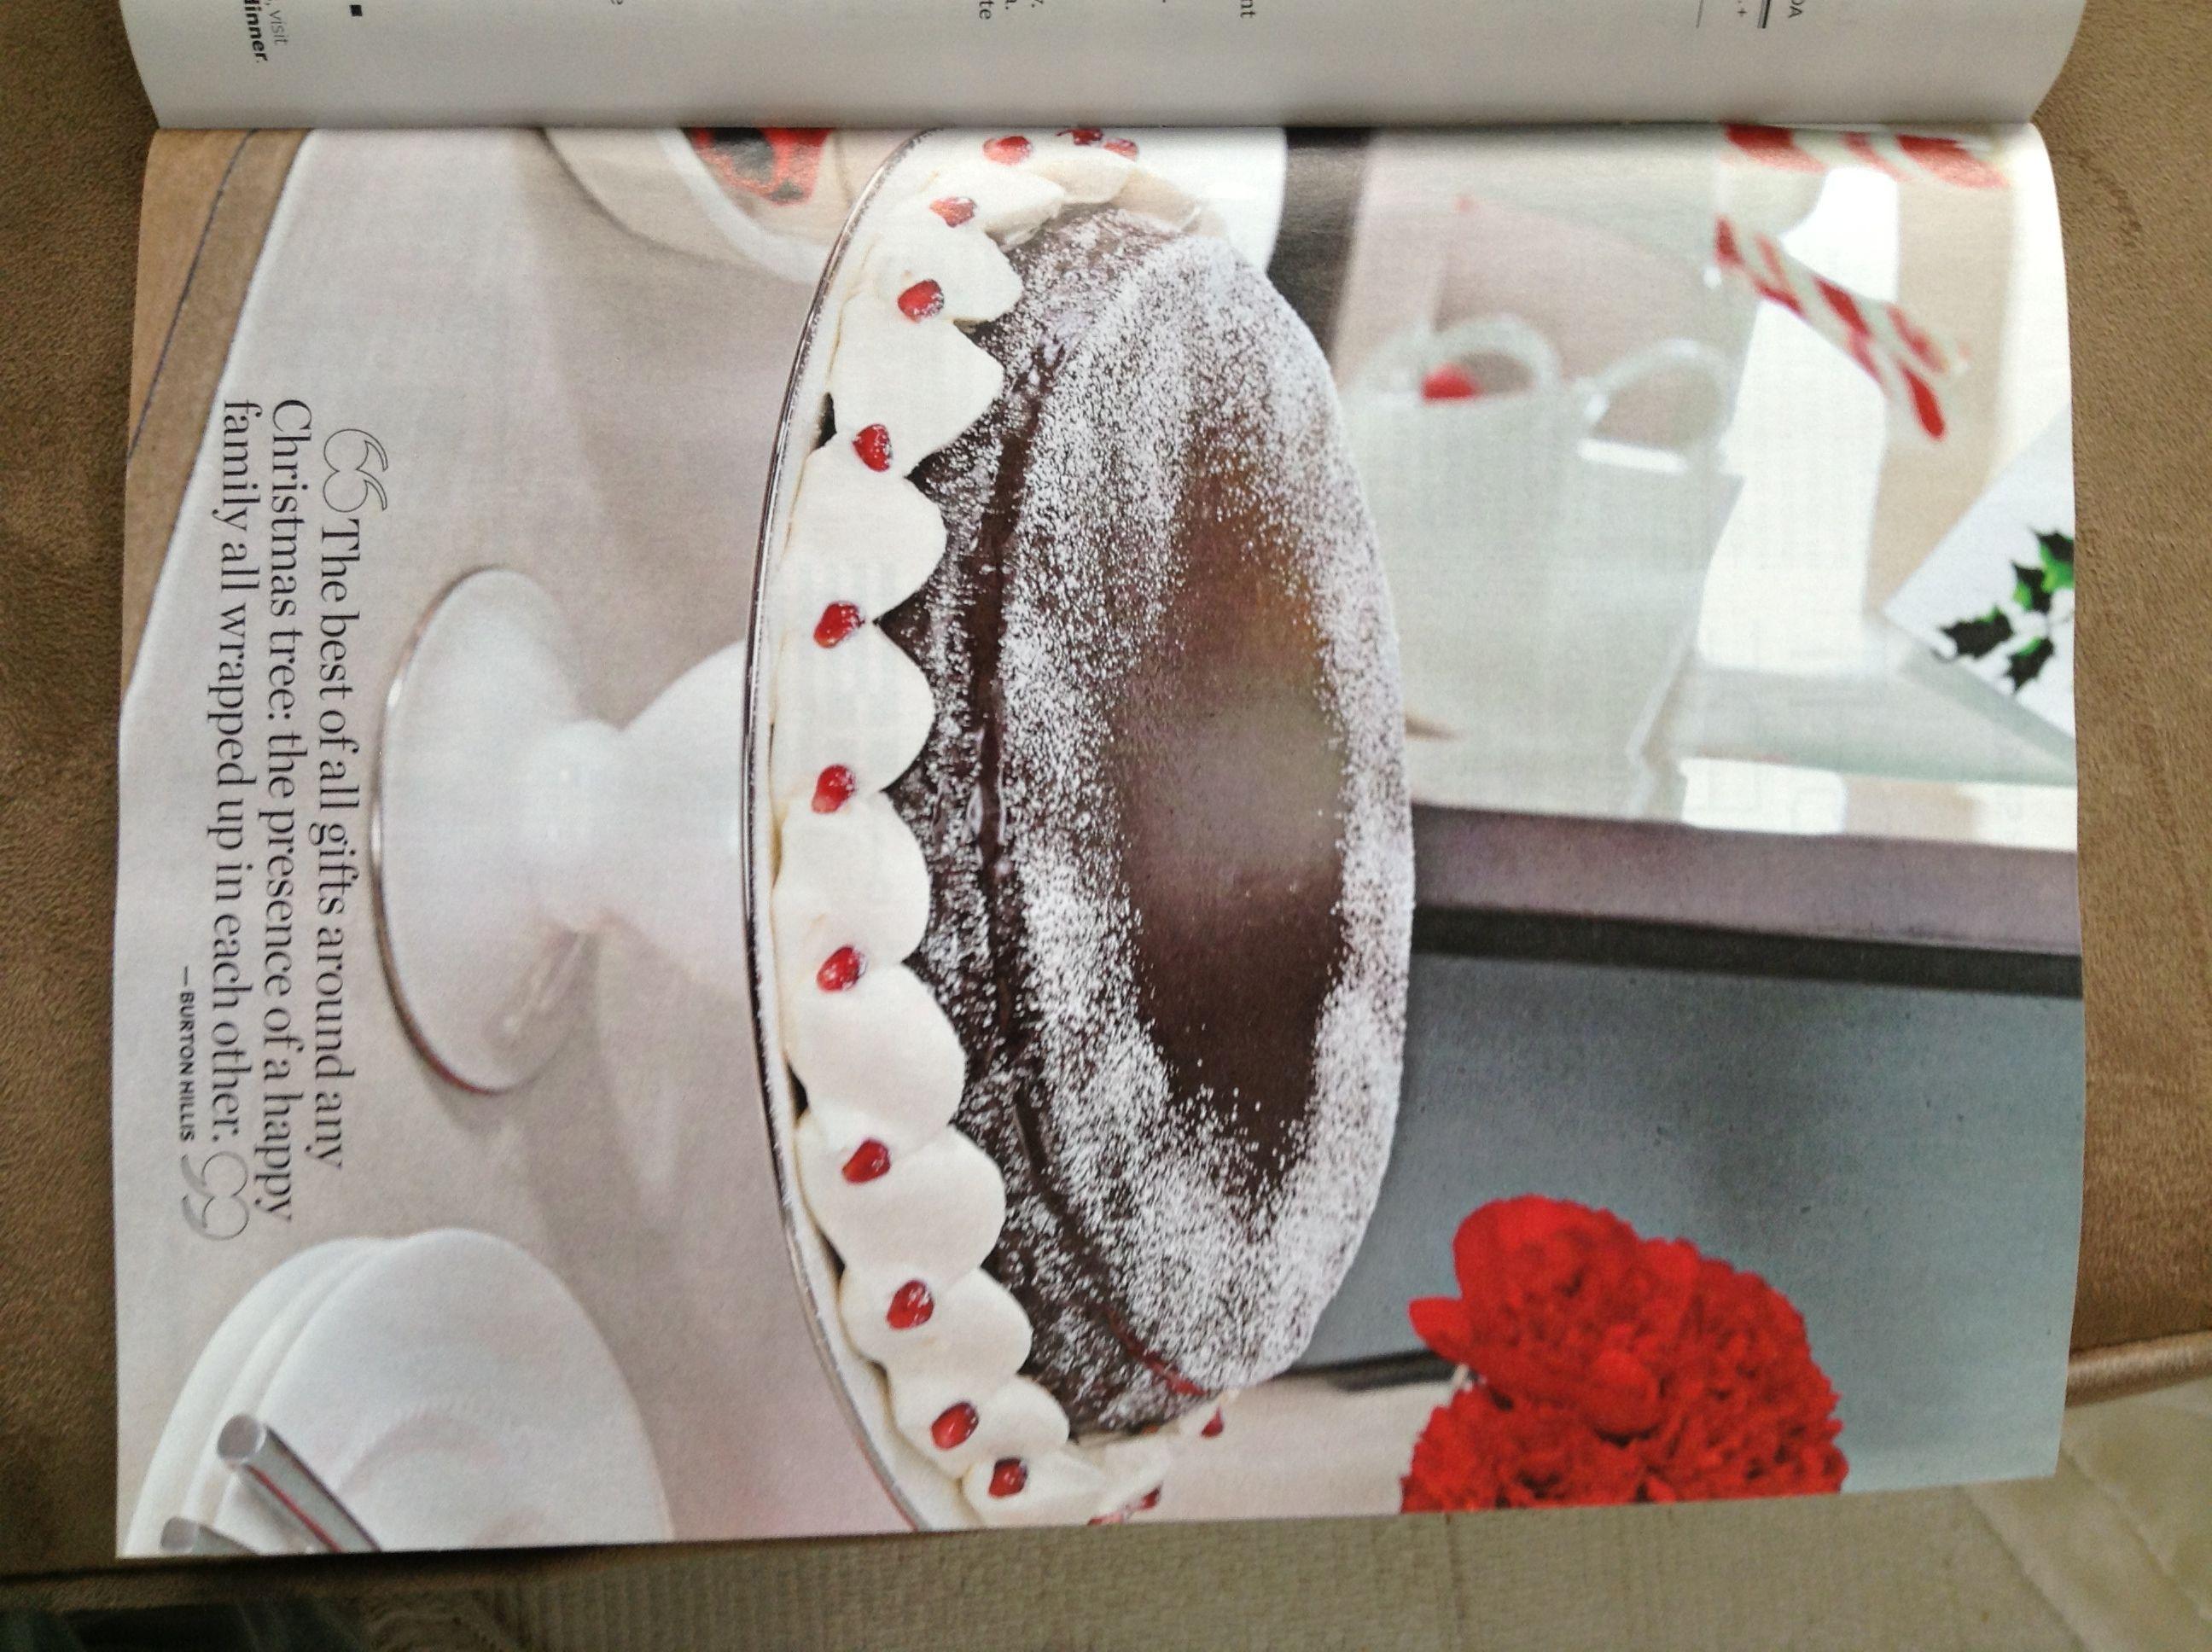 Dark chocolate flour less cake with images dark